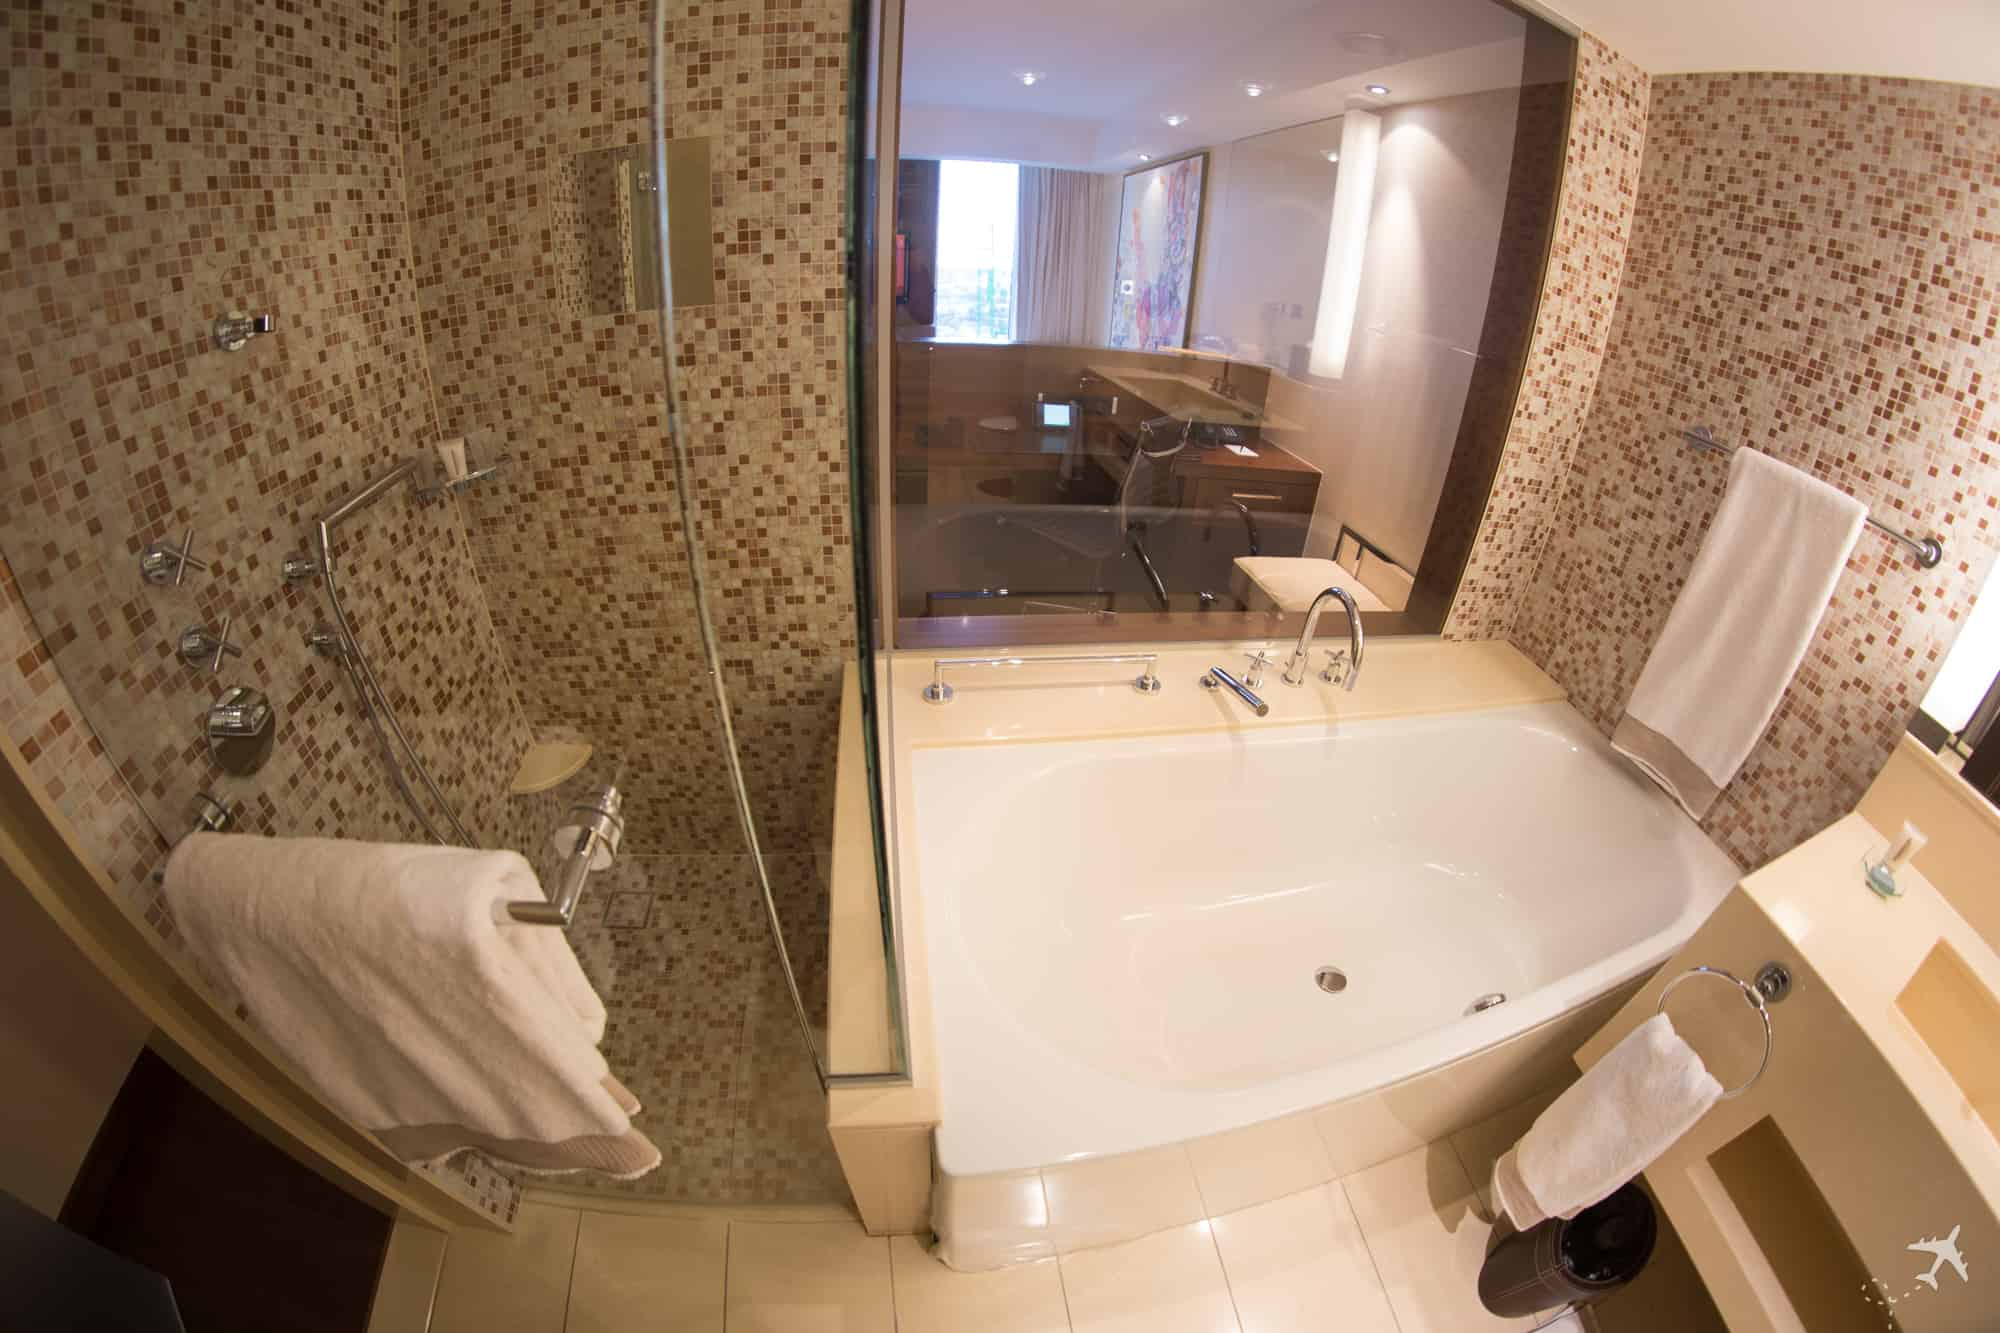 Jumeirah Hotel Frankfurt Dusche Badewanne